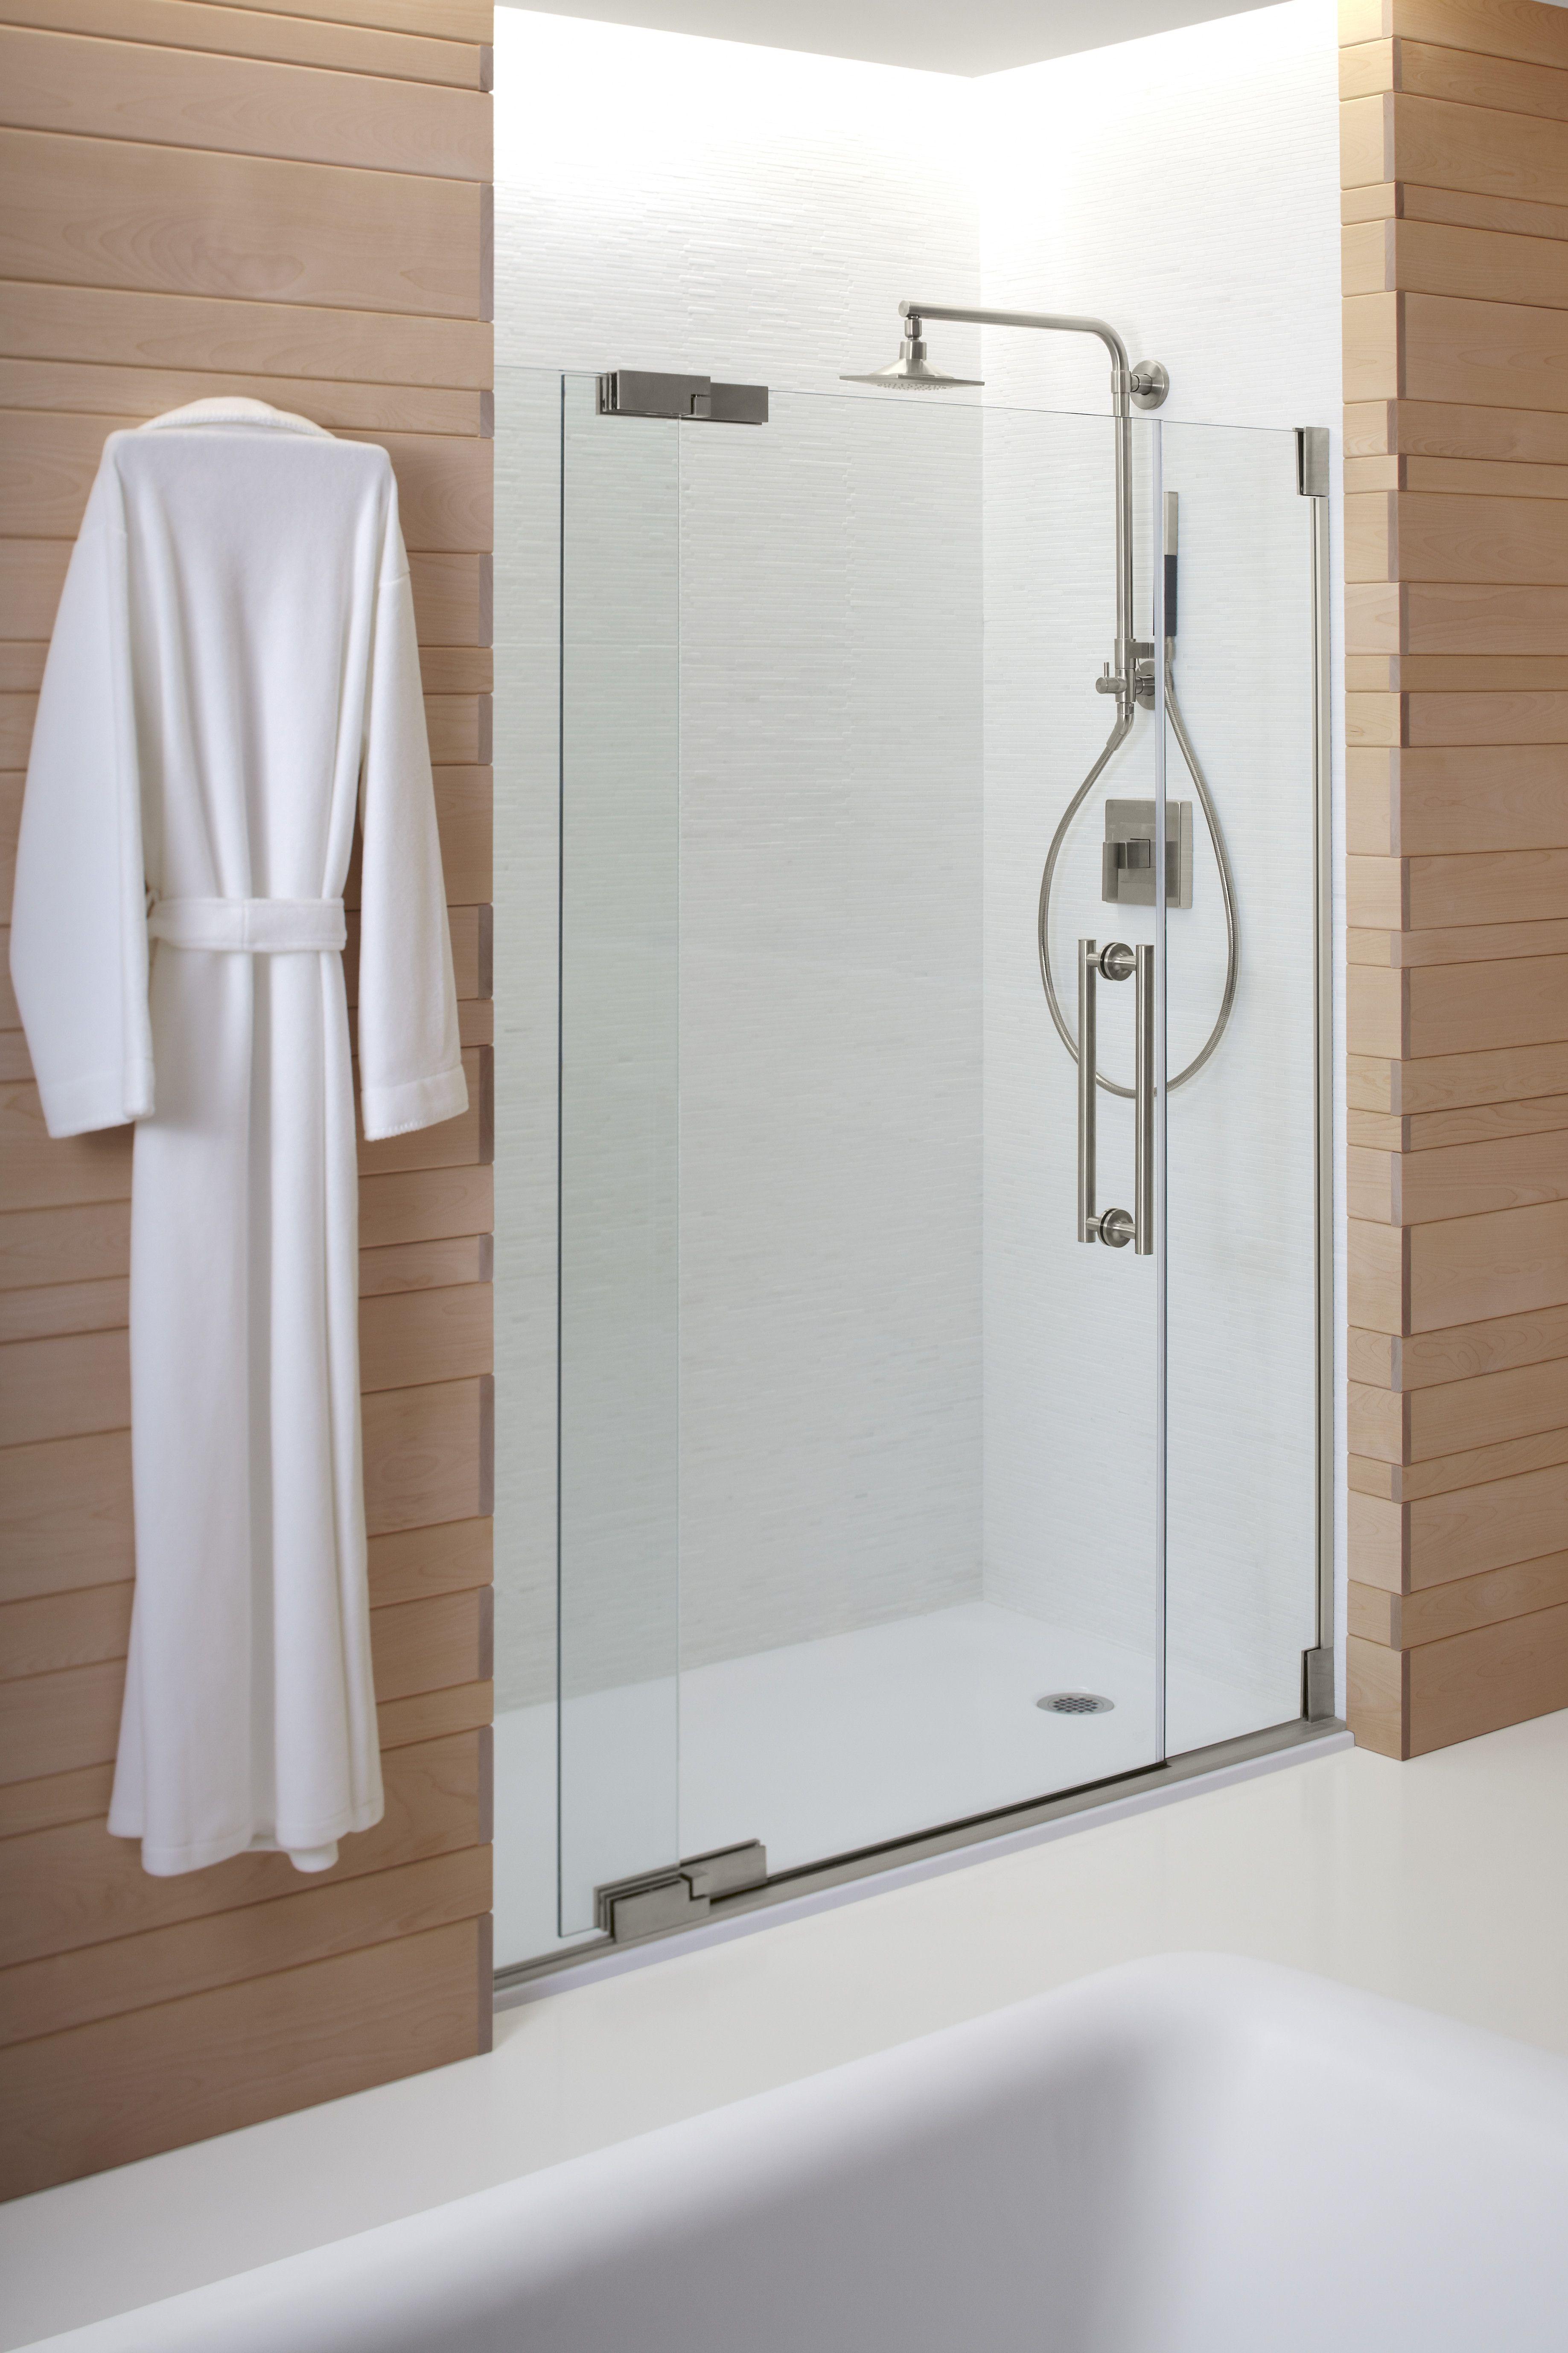 Kohler Levity Bath Shower Doors Levity Sliding Doors Feature A